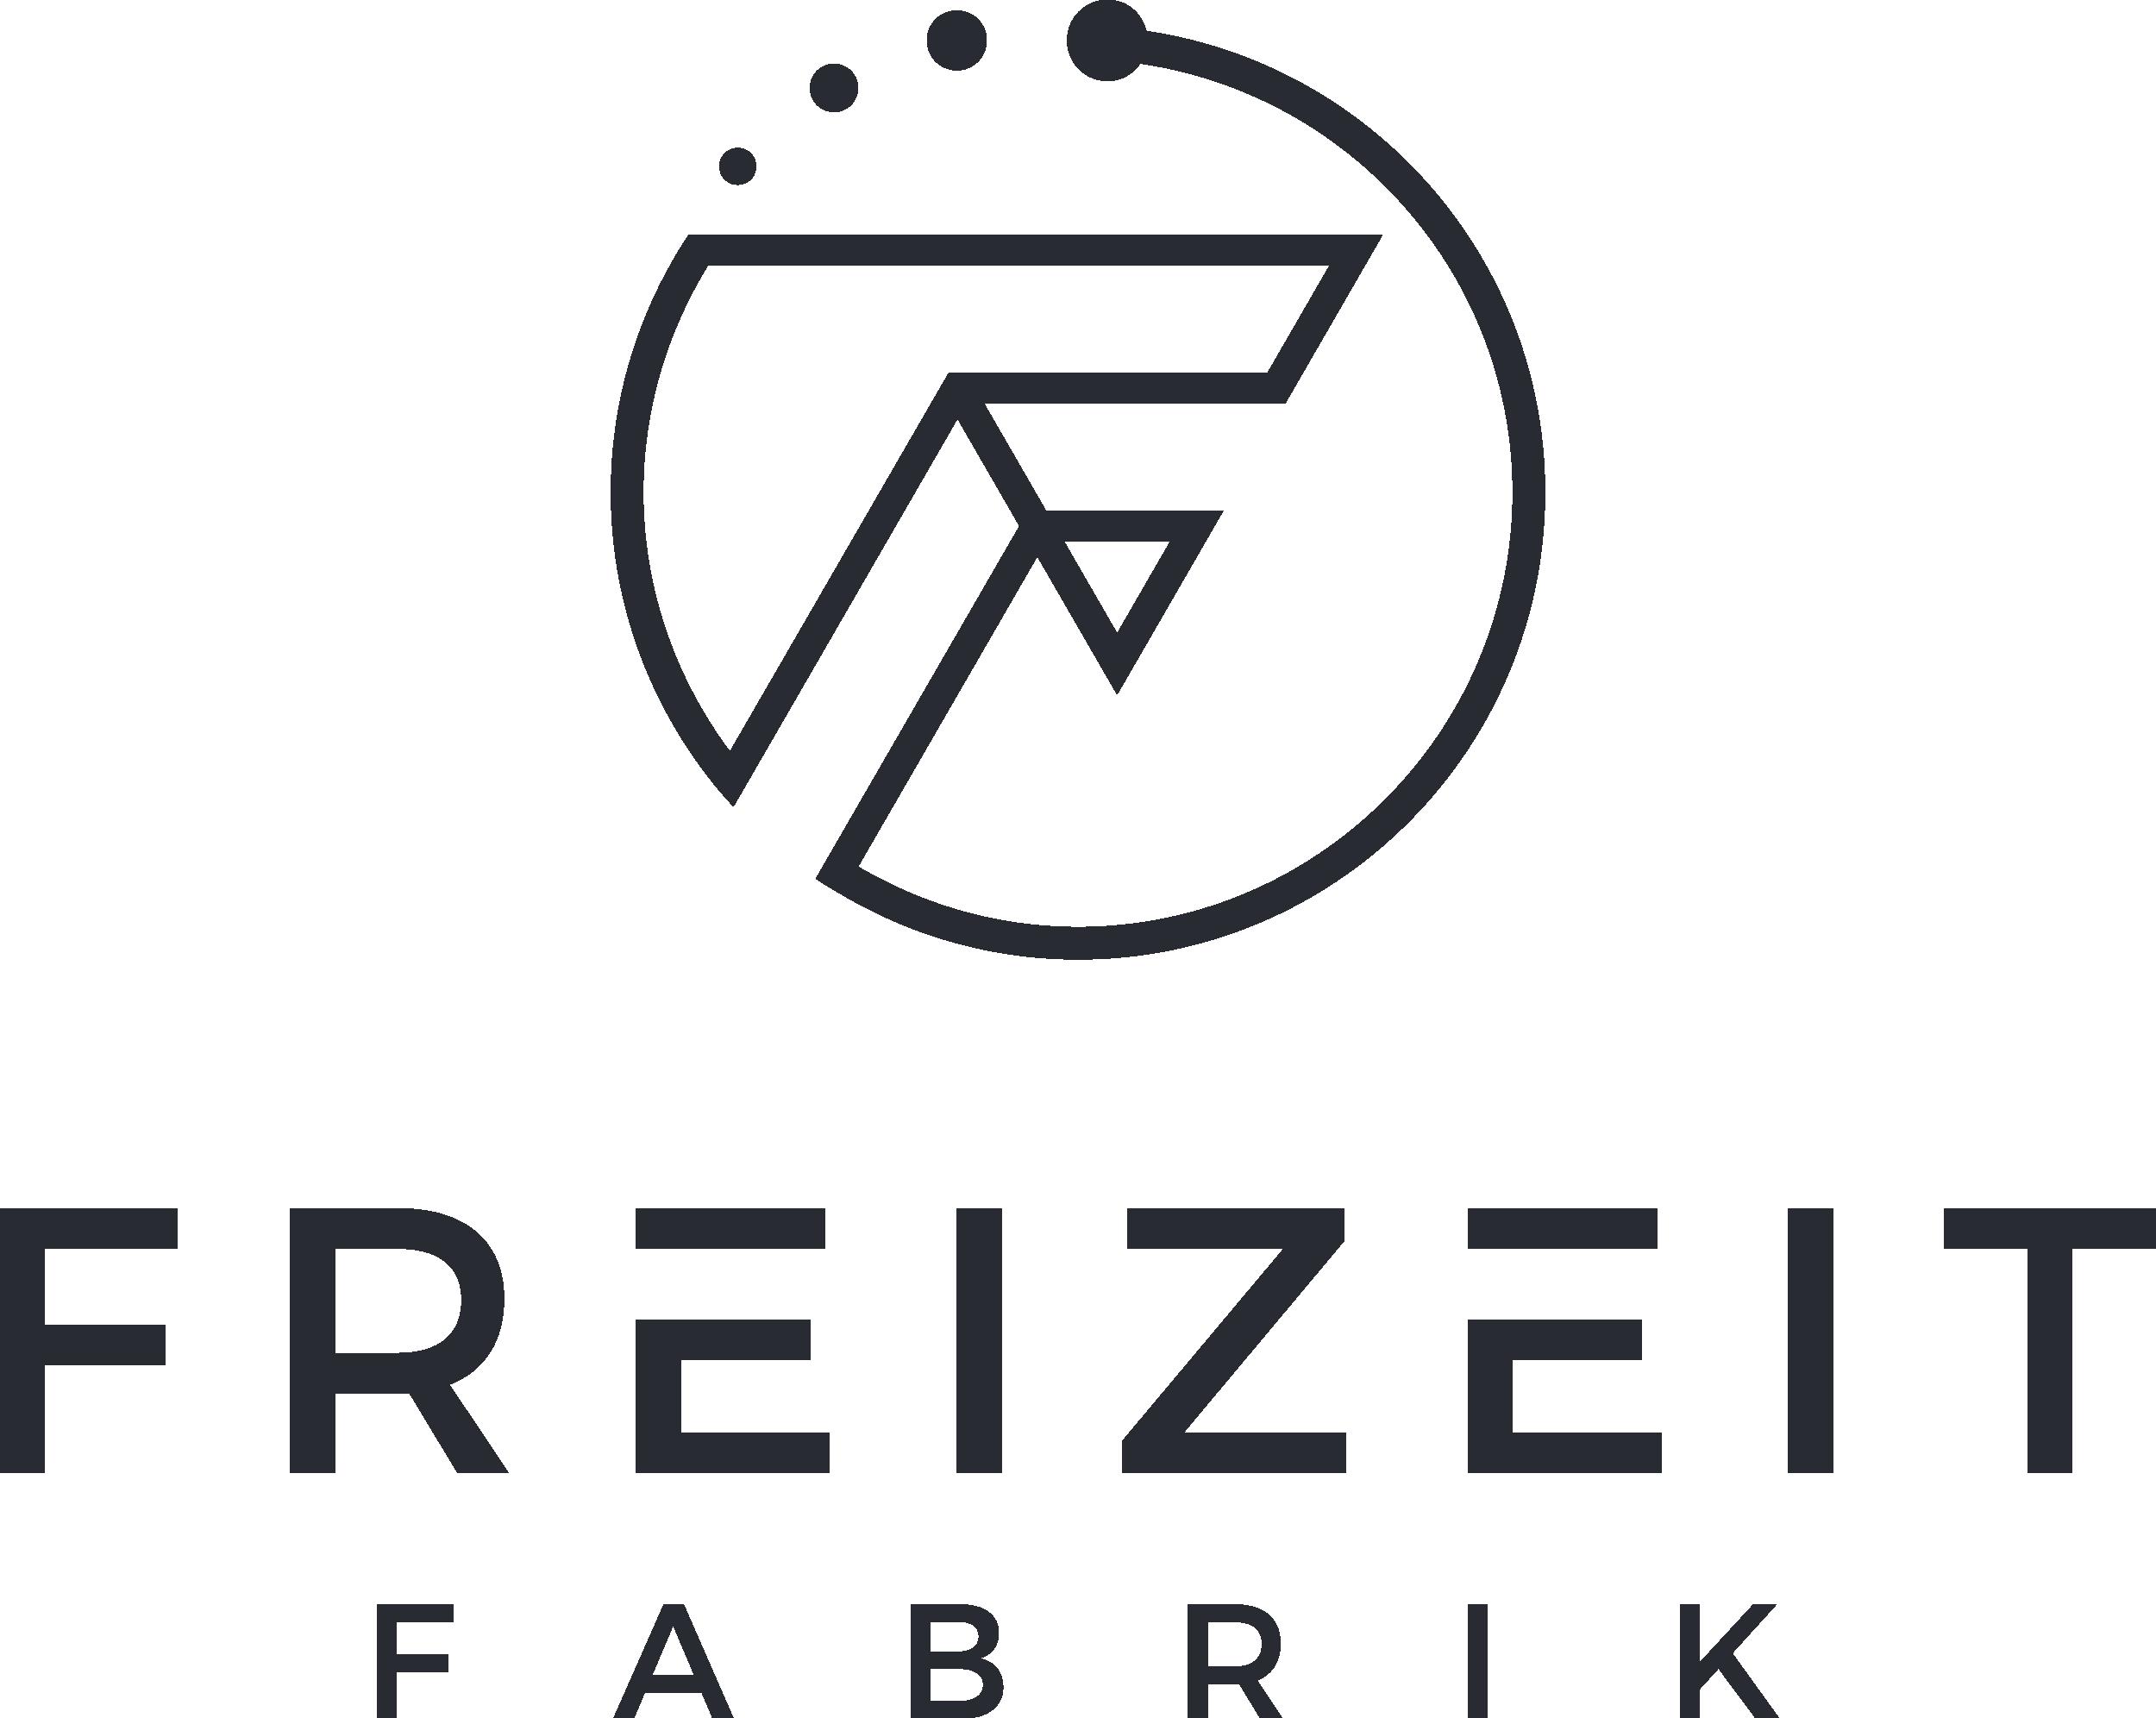 FreizeitFabrik (LeisureFactory) needs a nice and eyecatching logo